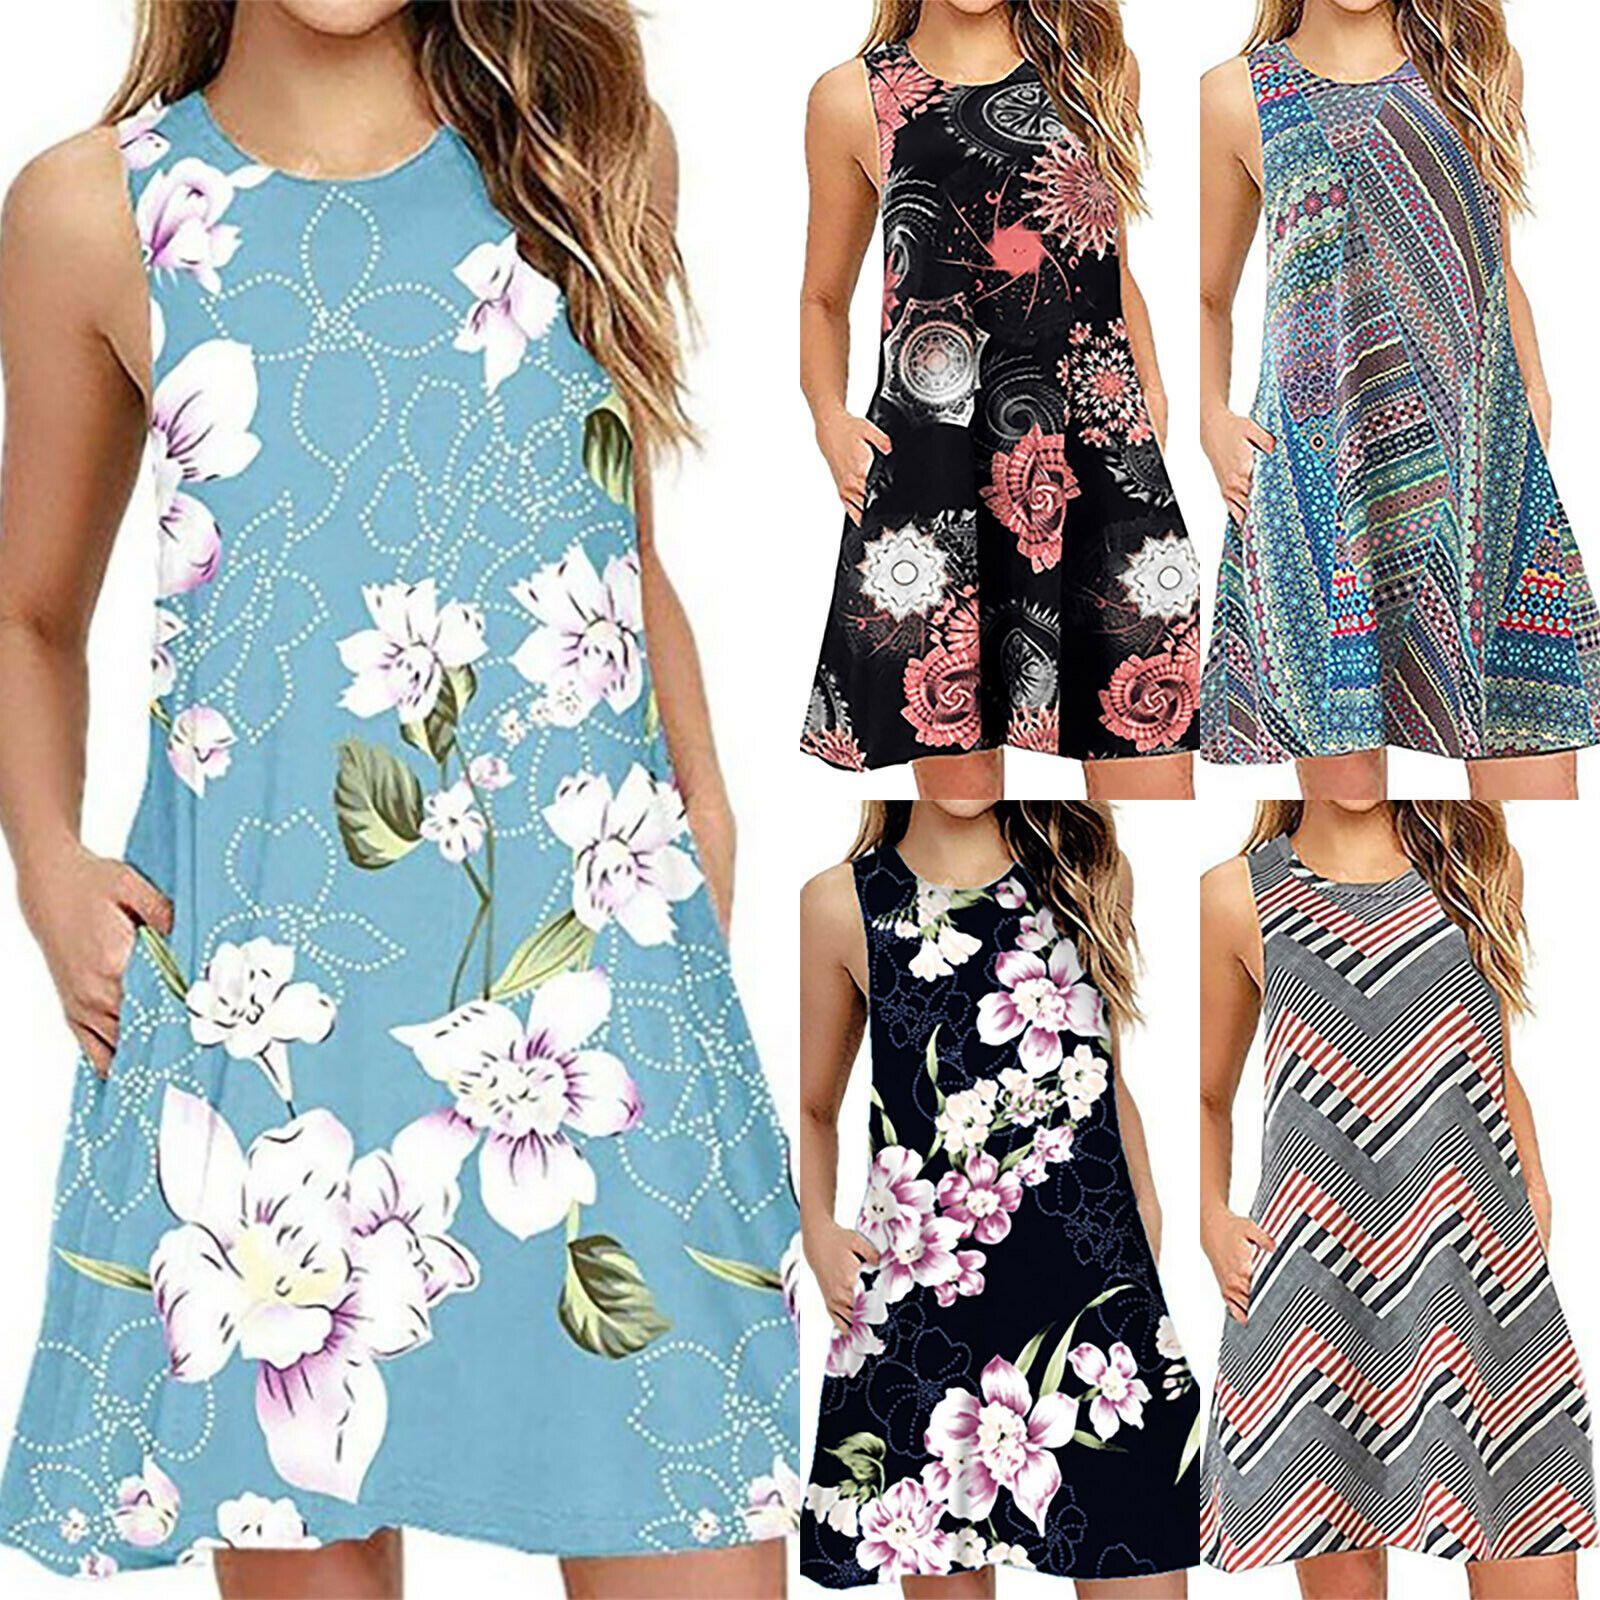 Women Casual Summer Mini Dress Loose Tunic Long Tank Top Blouse Dress Plus Size Long Dresses Ideas Of Plus Size Party Dresses Mini Dress Mini Dress Casual [ 1600 x 1600 Pixel ]